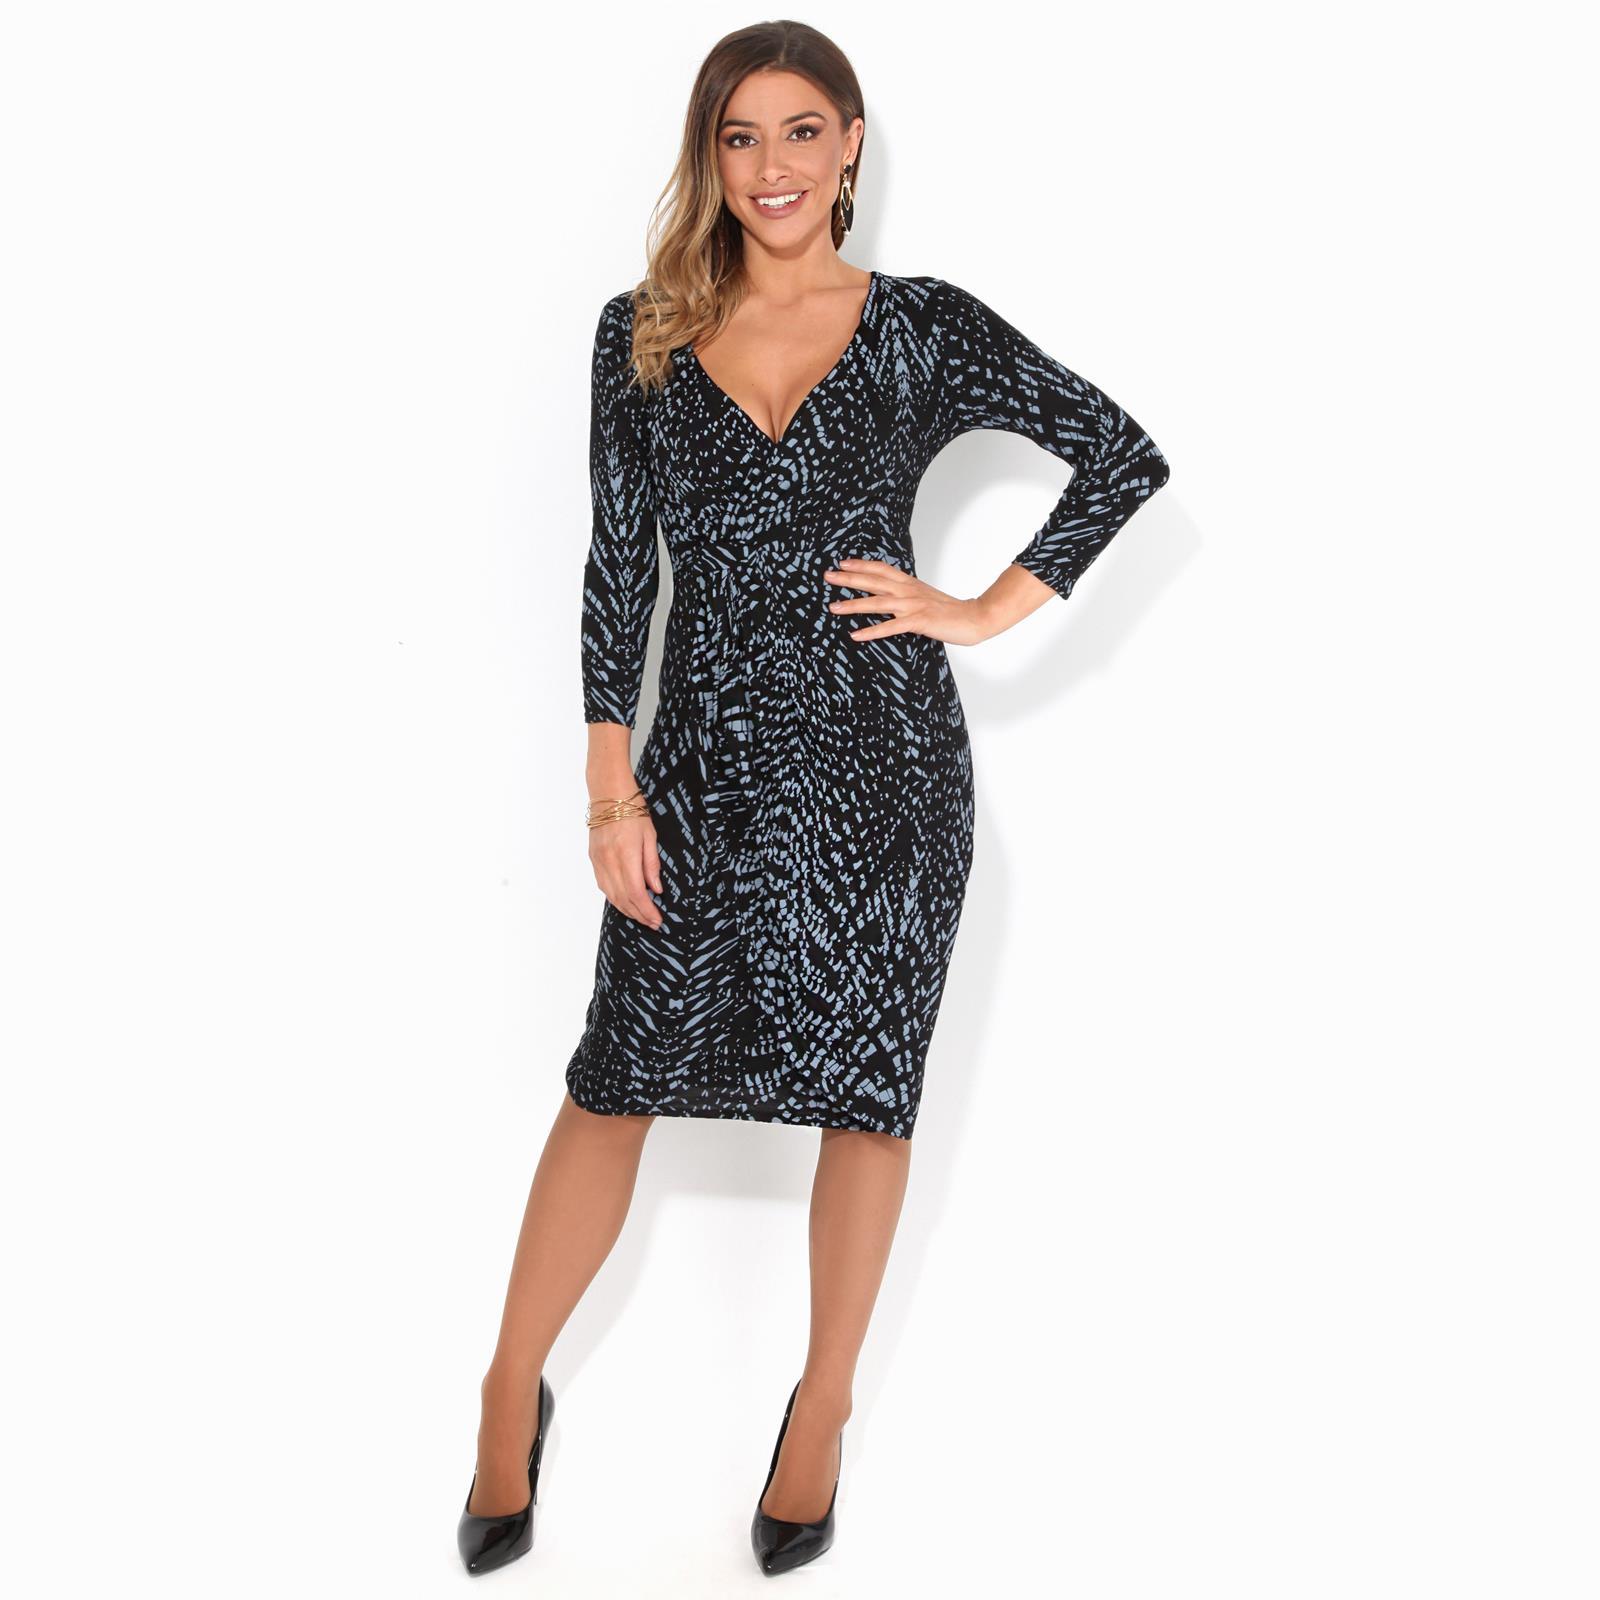 Womens-V-Neck-Dress-Top-Bodycon-Skirt-Midi-Snakeskin-Print-Cross-Over-Party-Wrap thumbnail 9